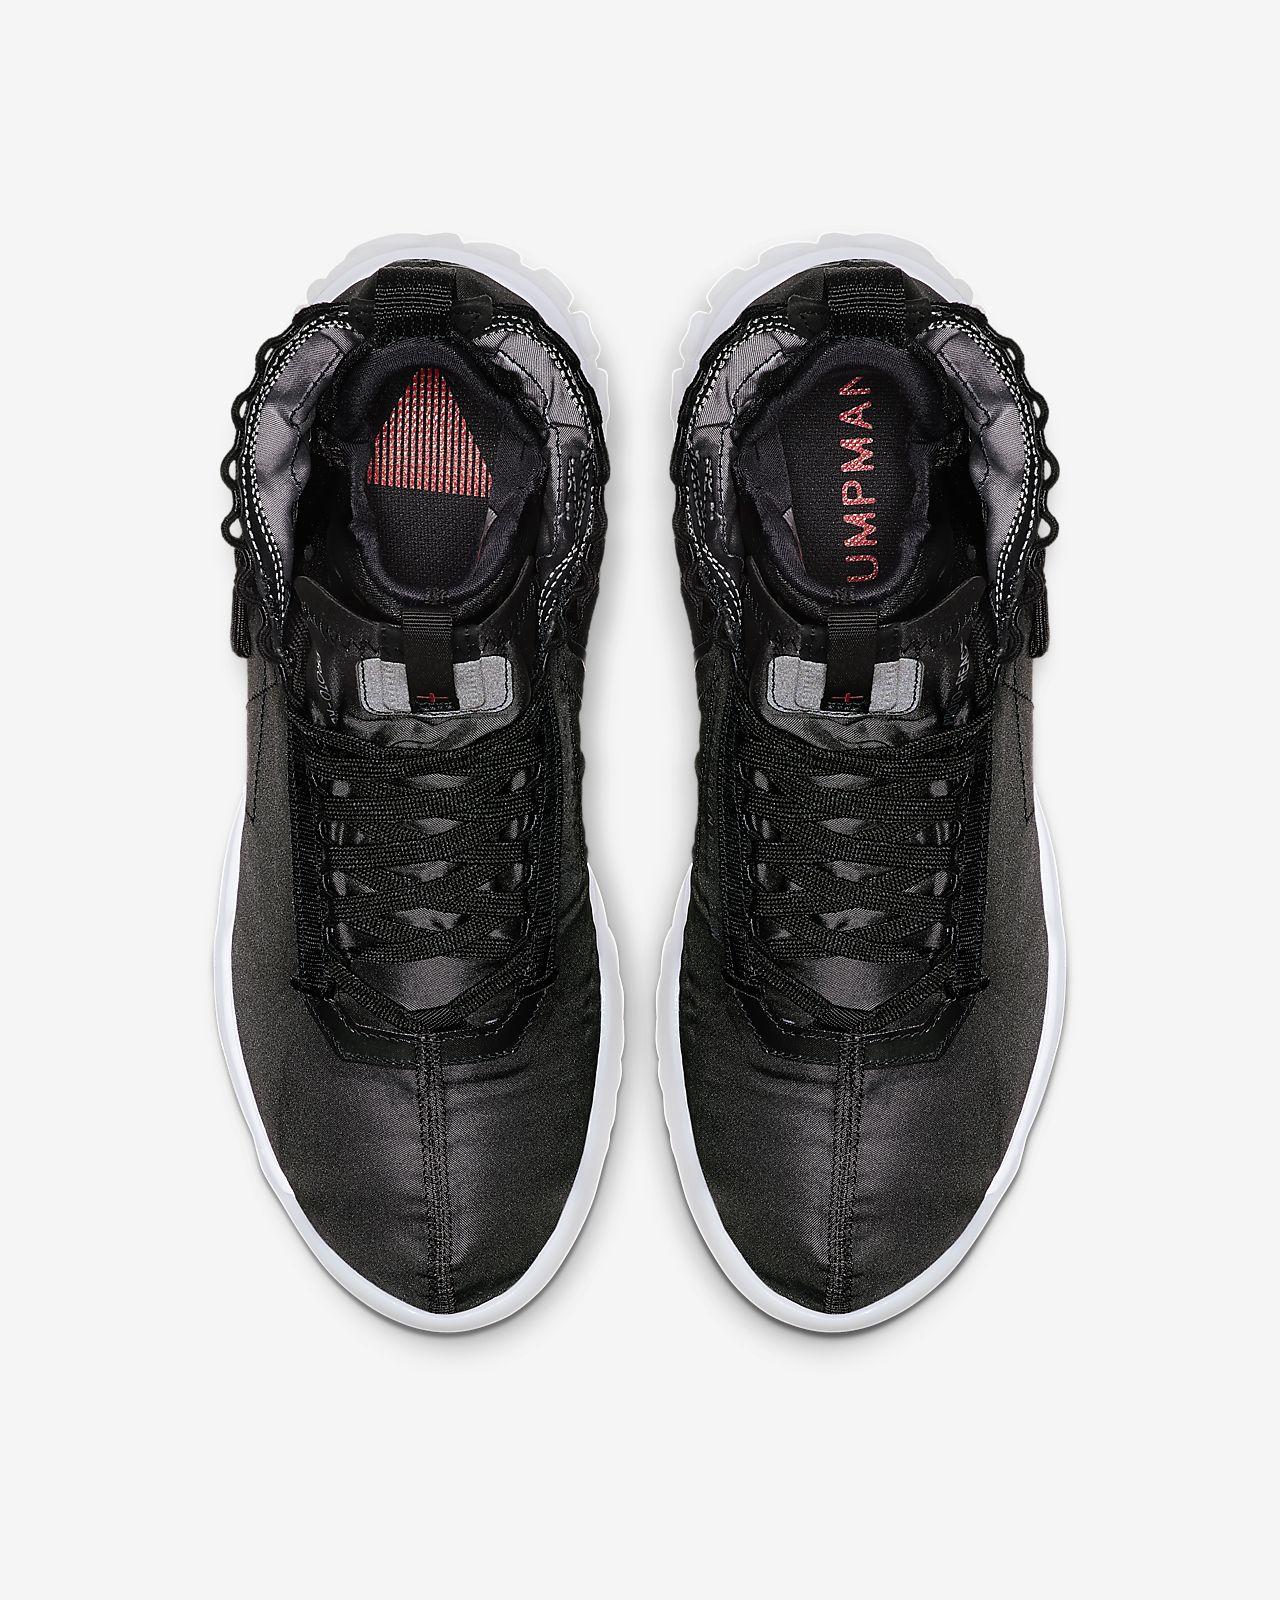 67f77ada1019 Jordan Proto-React Men s Shoe. Nike.com